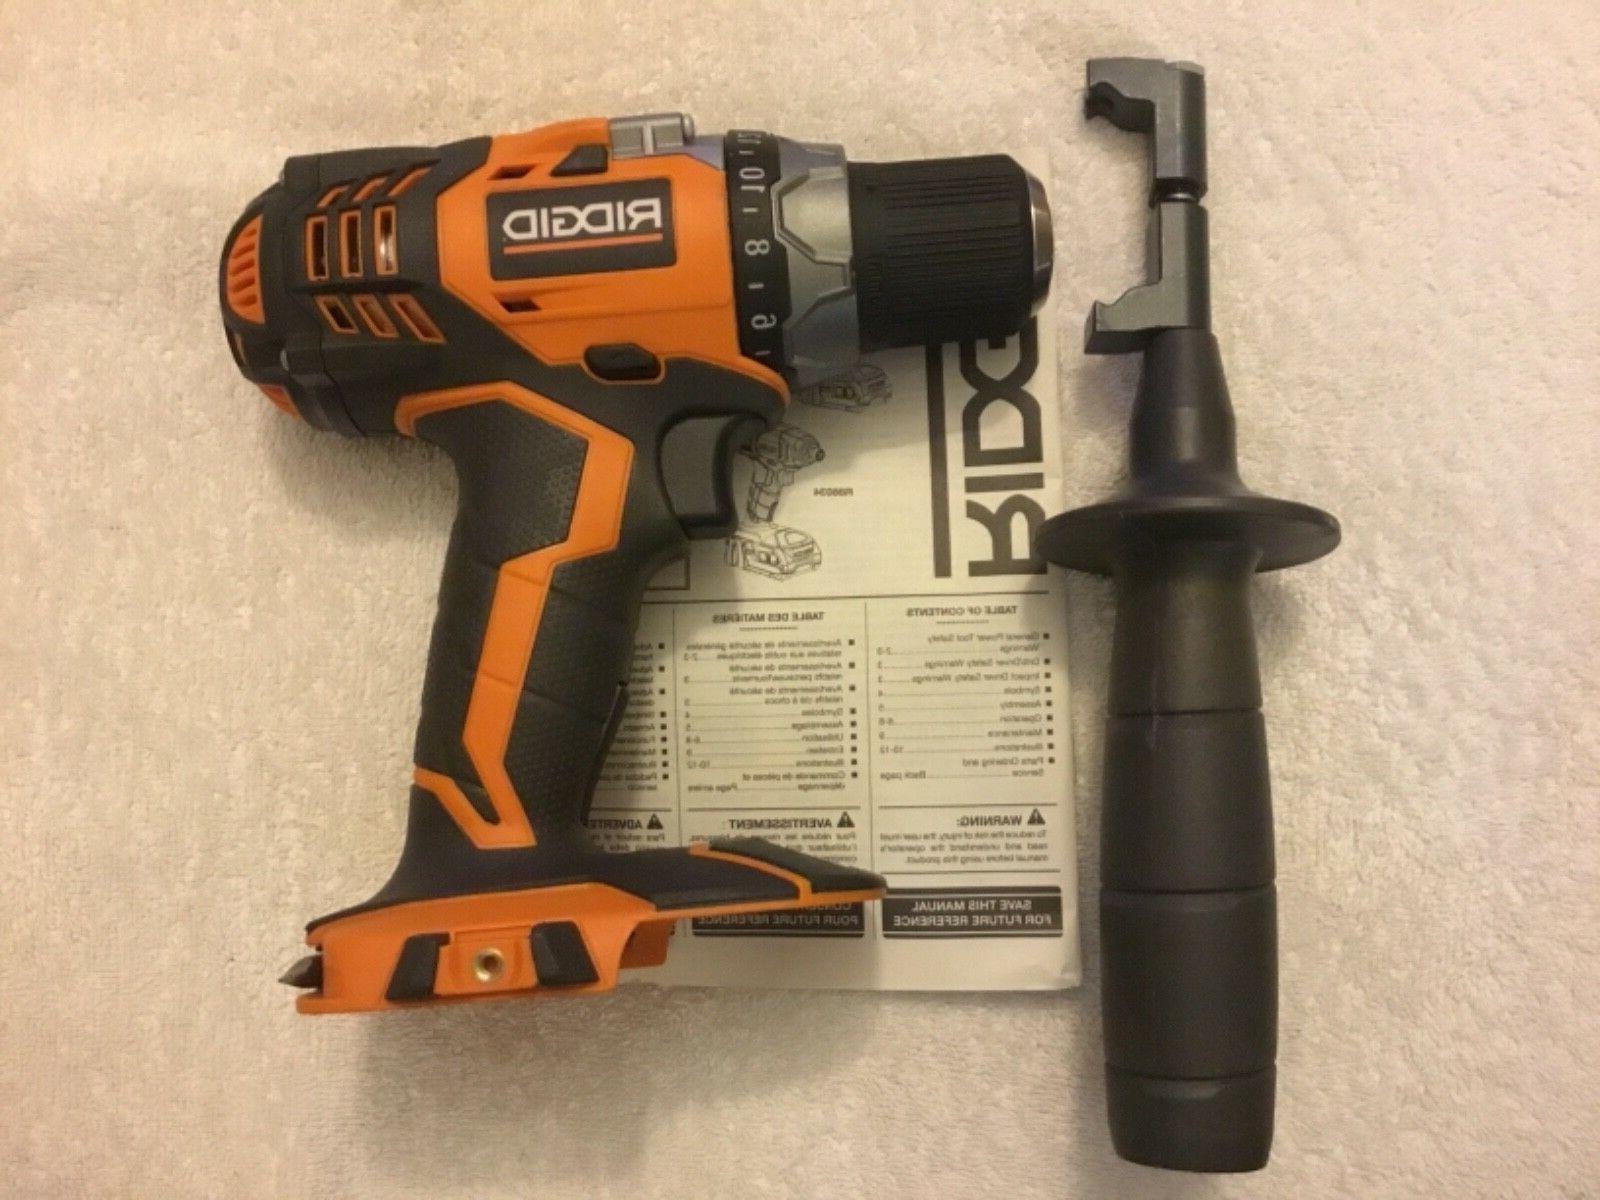 New Ridgid 18 Volt X4 Cordless Drill Driver Lithium